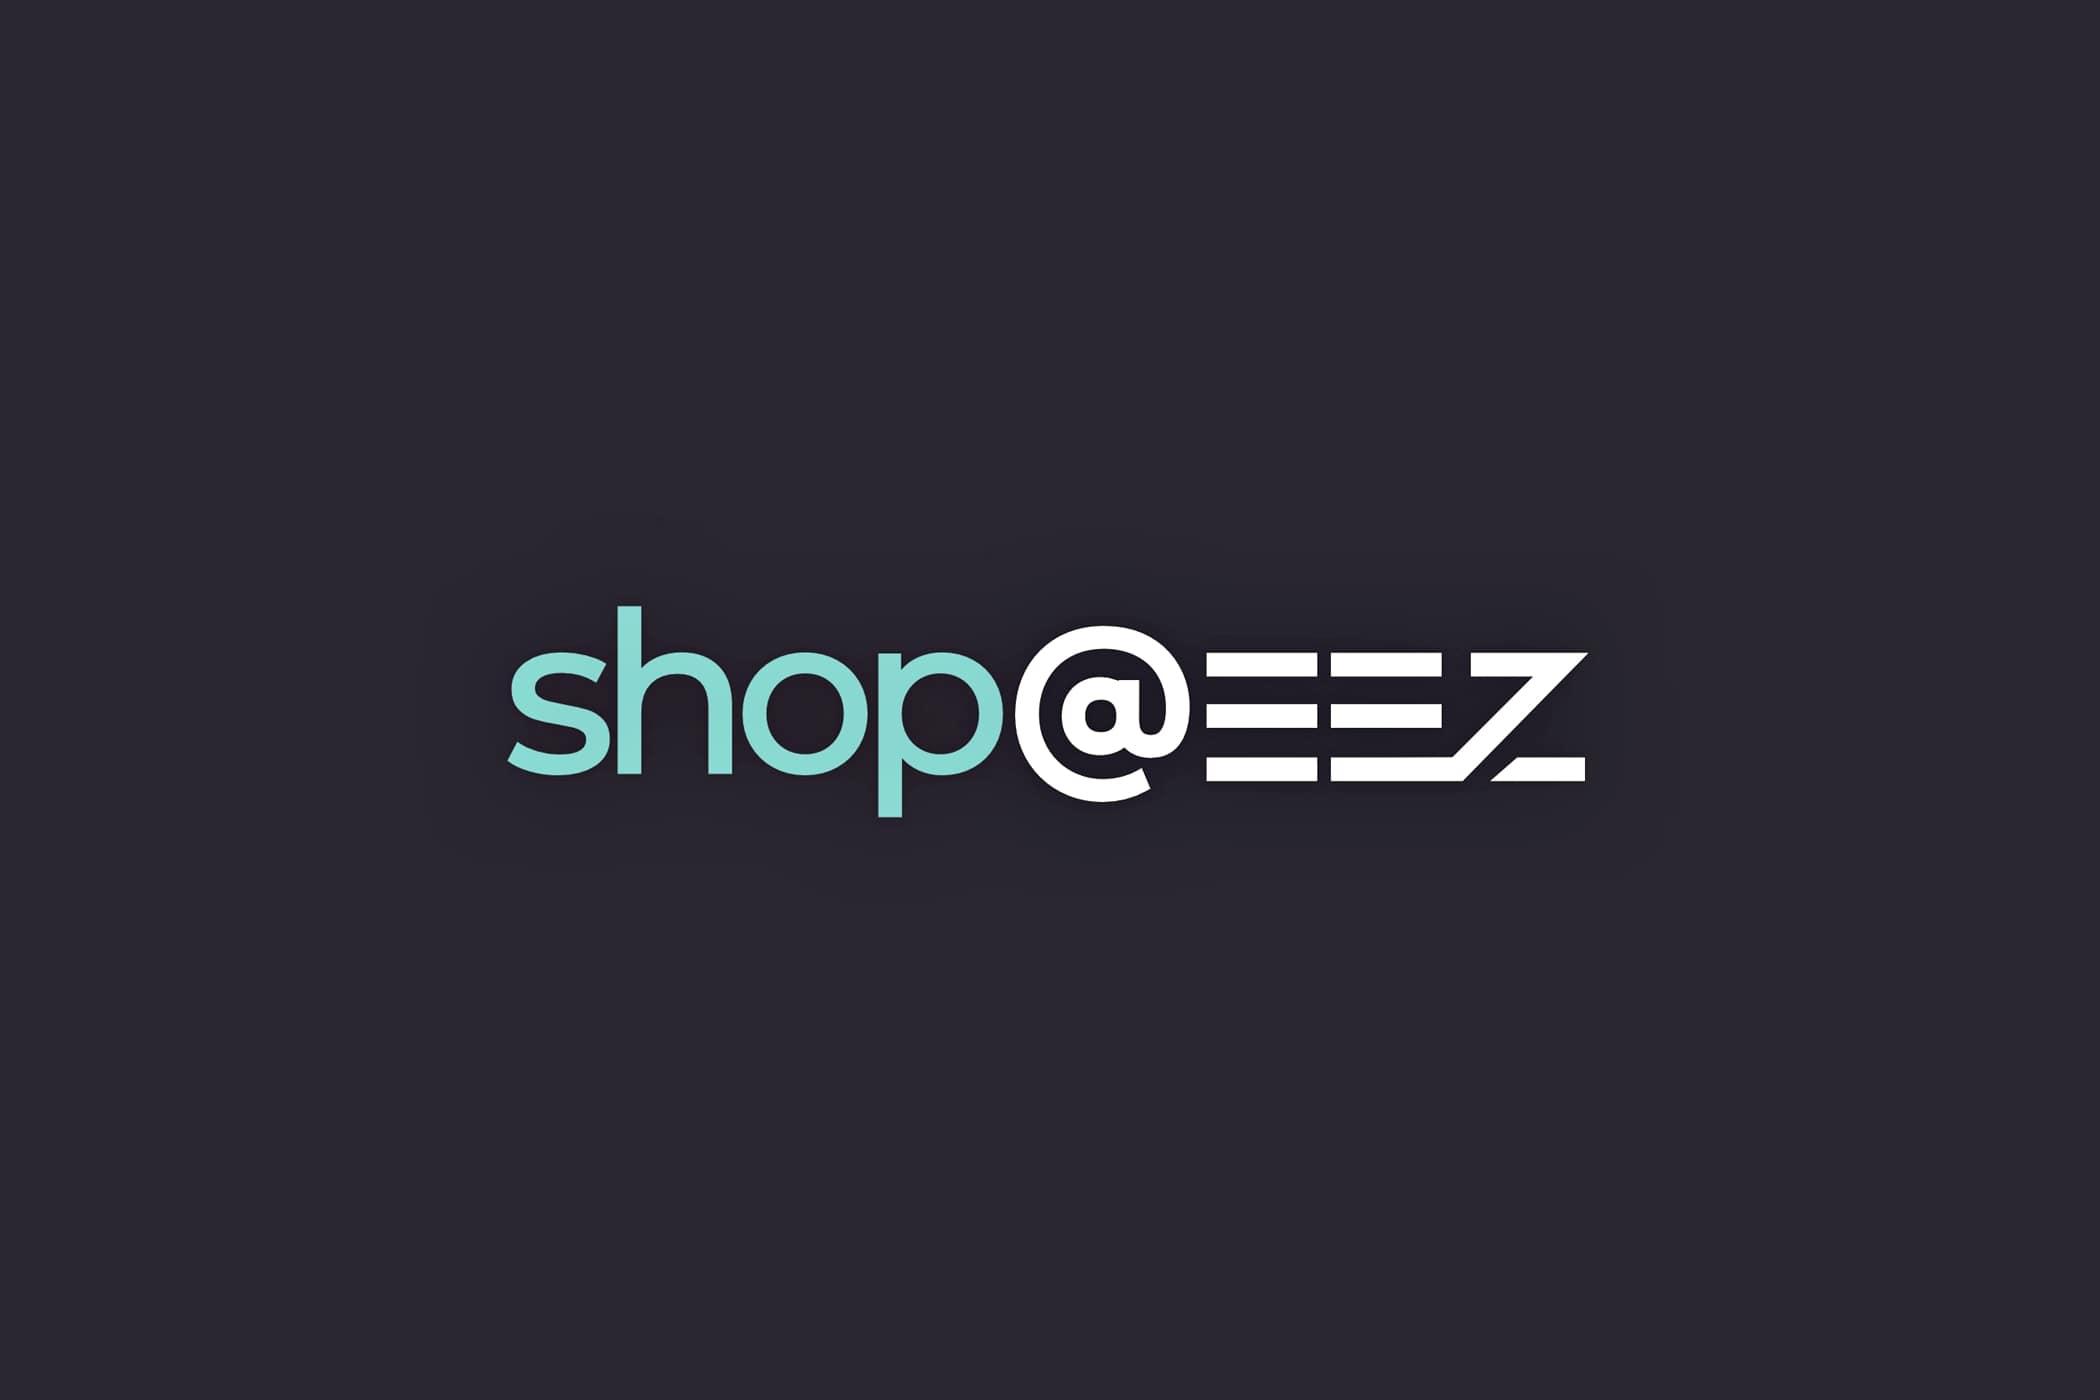 Shop@eez Logo